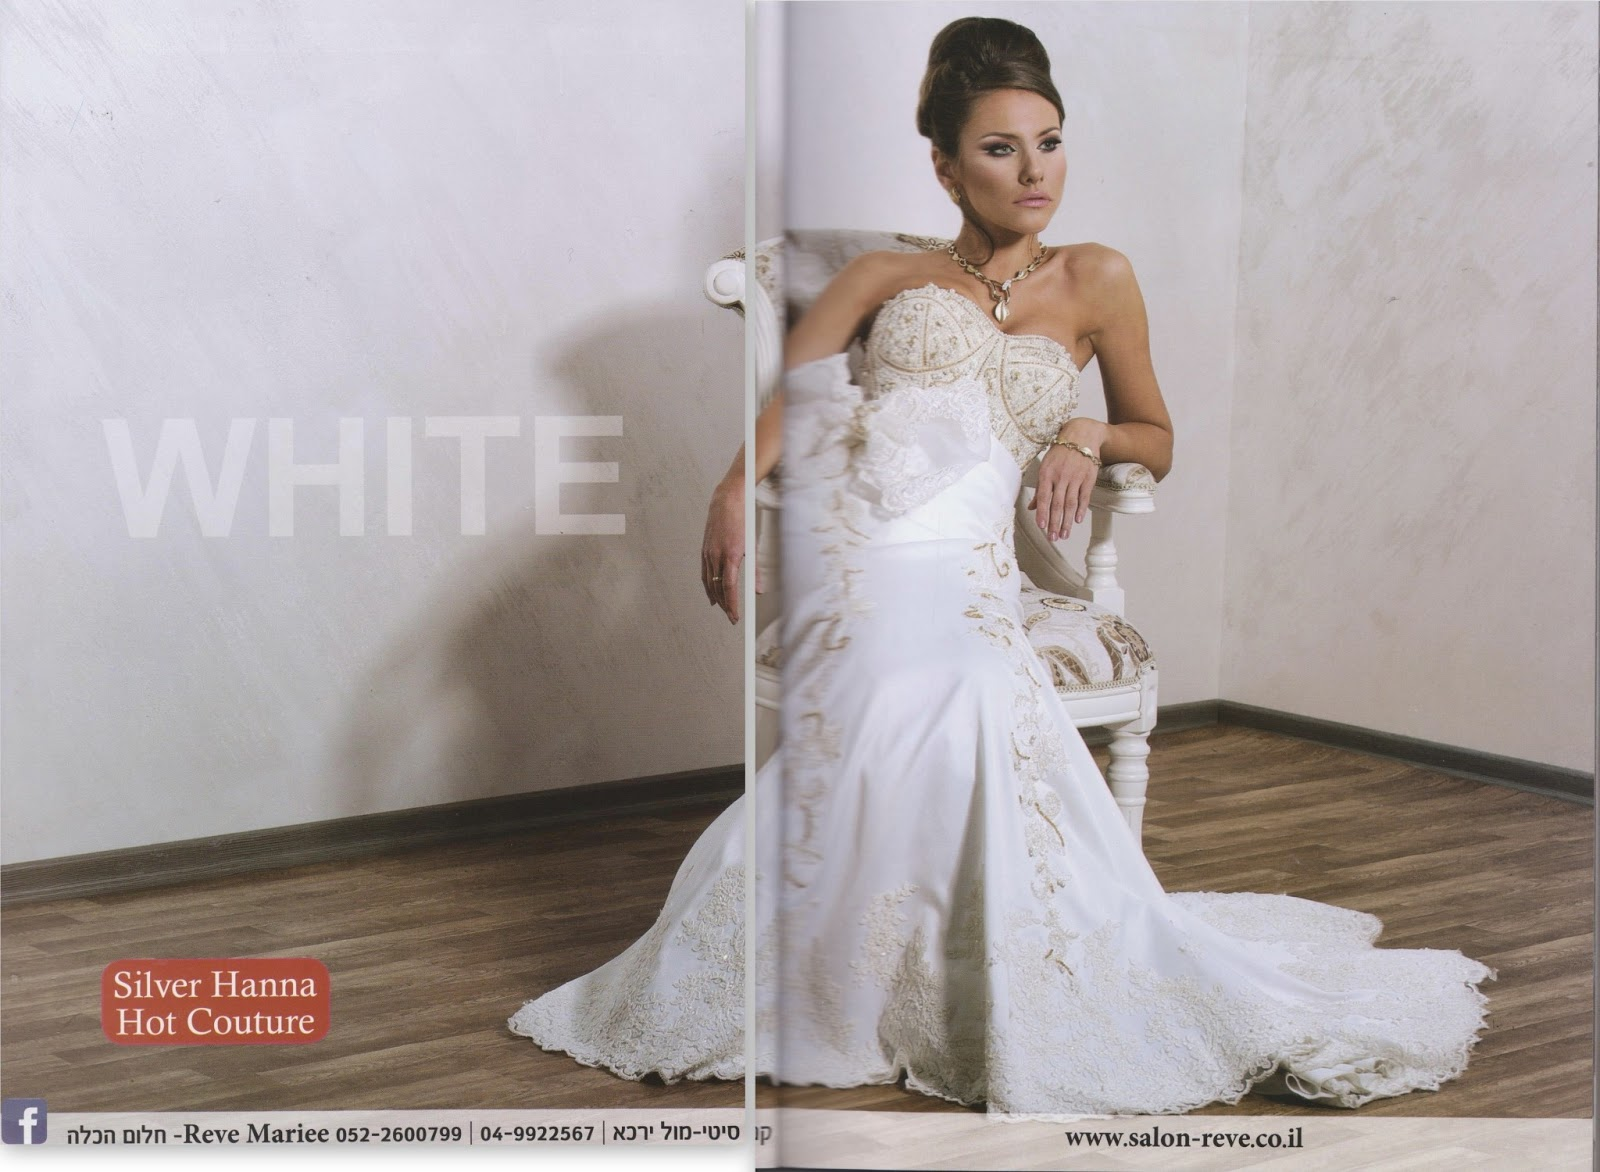 Silver Hanna Ad for silver hanna bridal